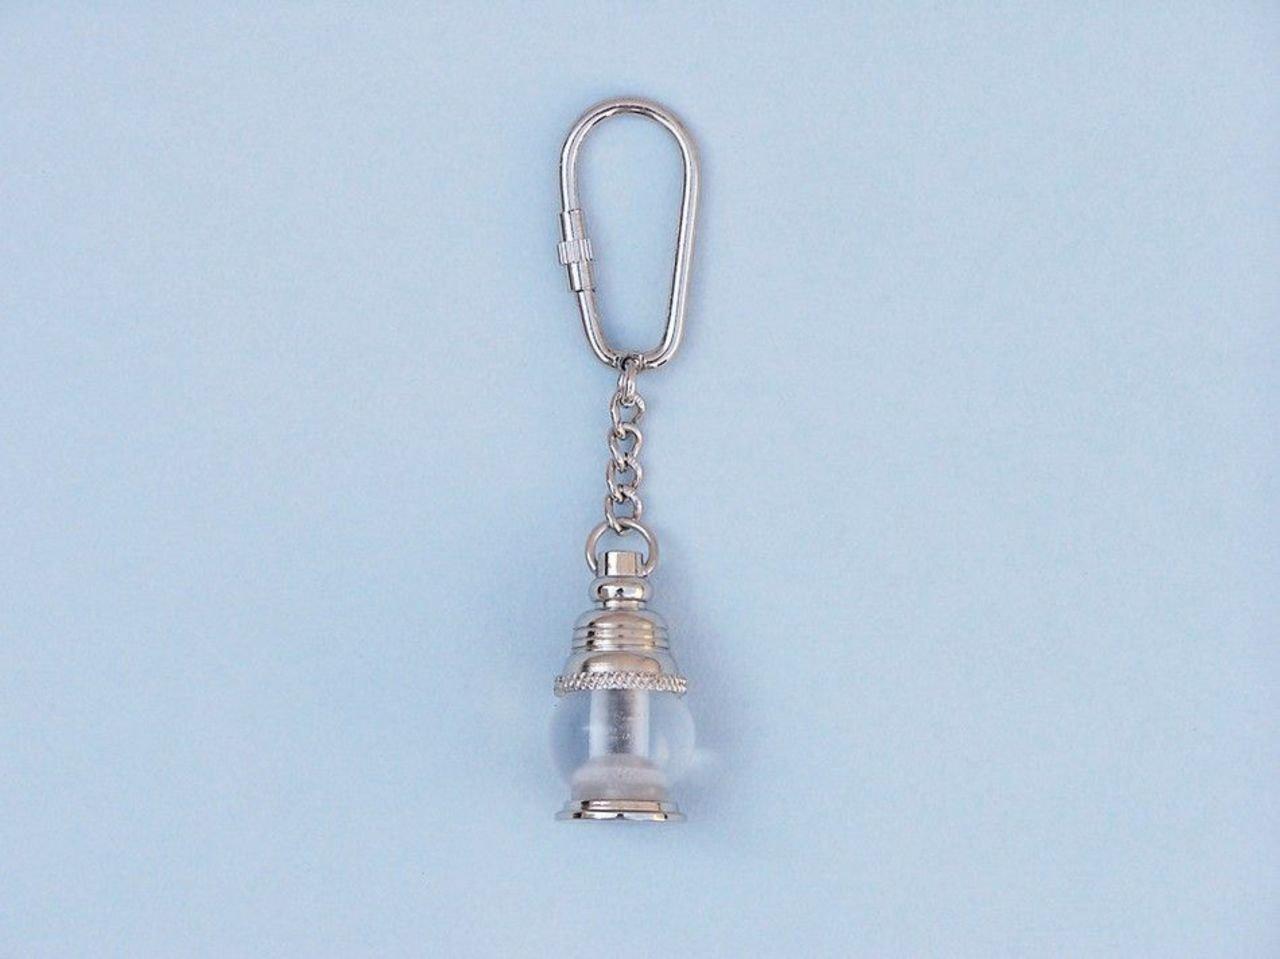 Key Chain Oil lamp Chrome Keyring Hampton Nautical K-290-CH Chrome Oil lamp Key Chain 5